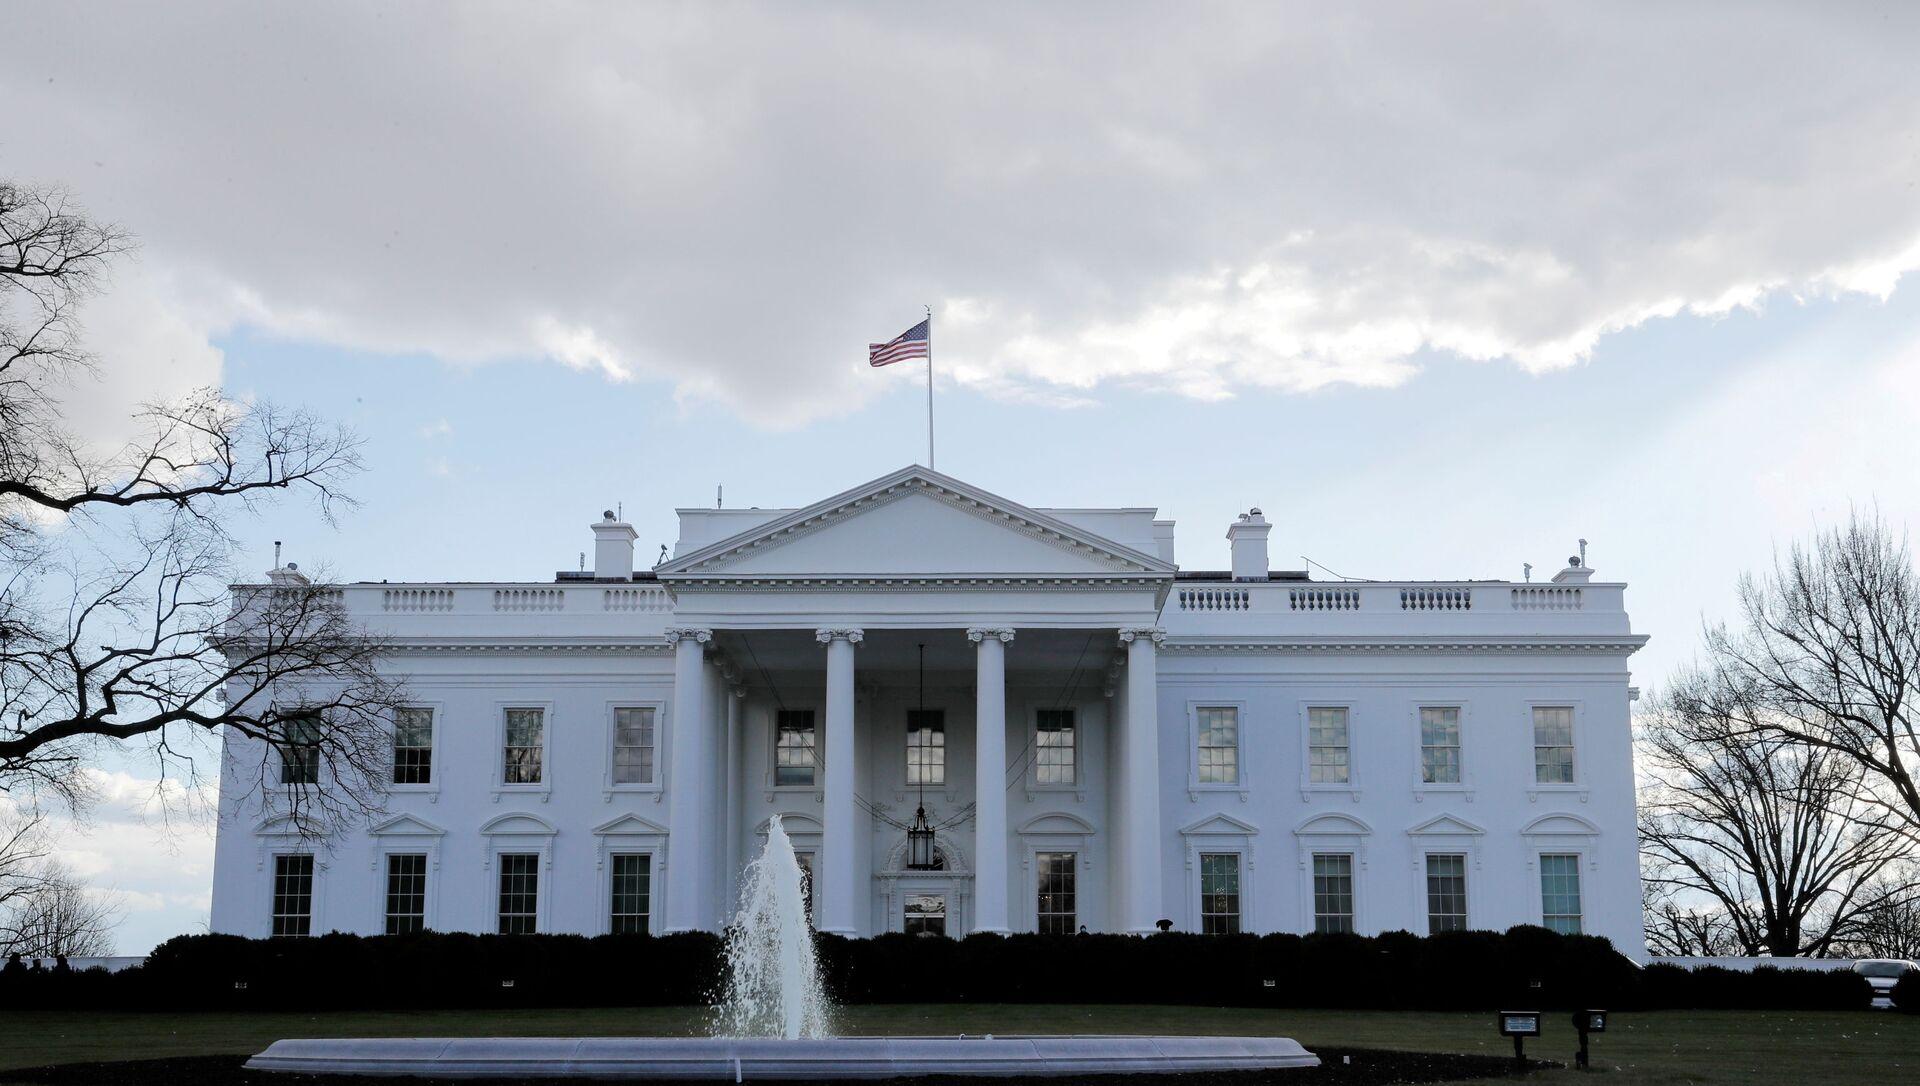 A view of the White House in Washington, U.S. January 18, 2021. - Sputnik International, 1920, 31.07.2021